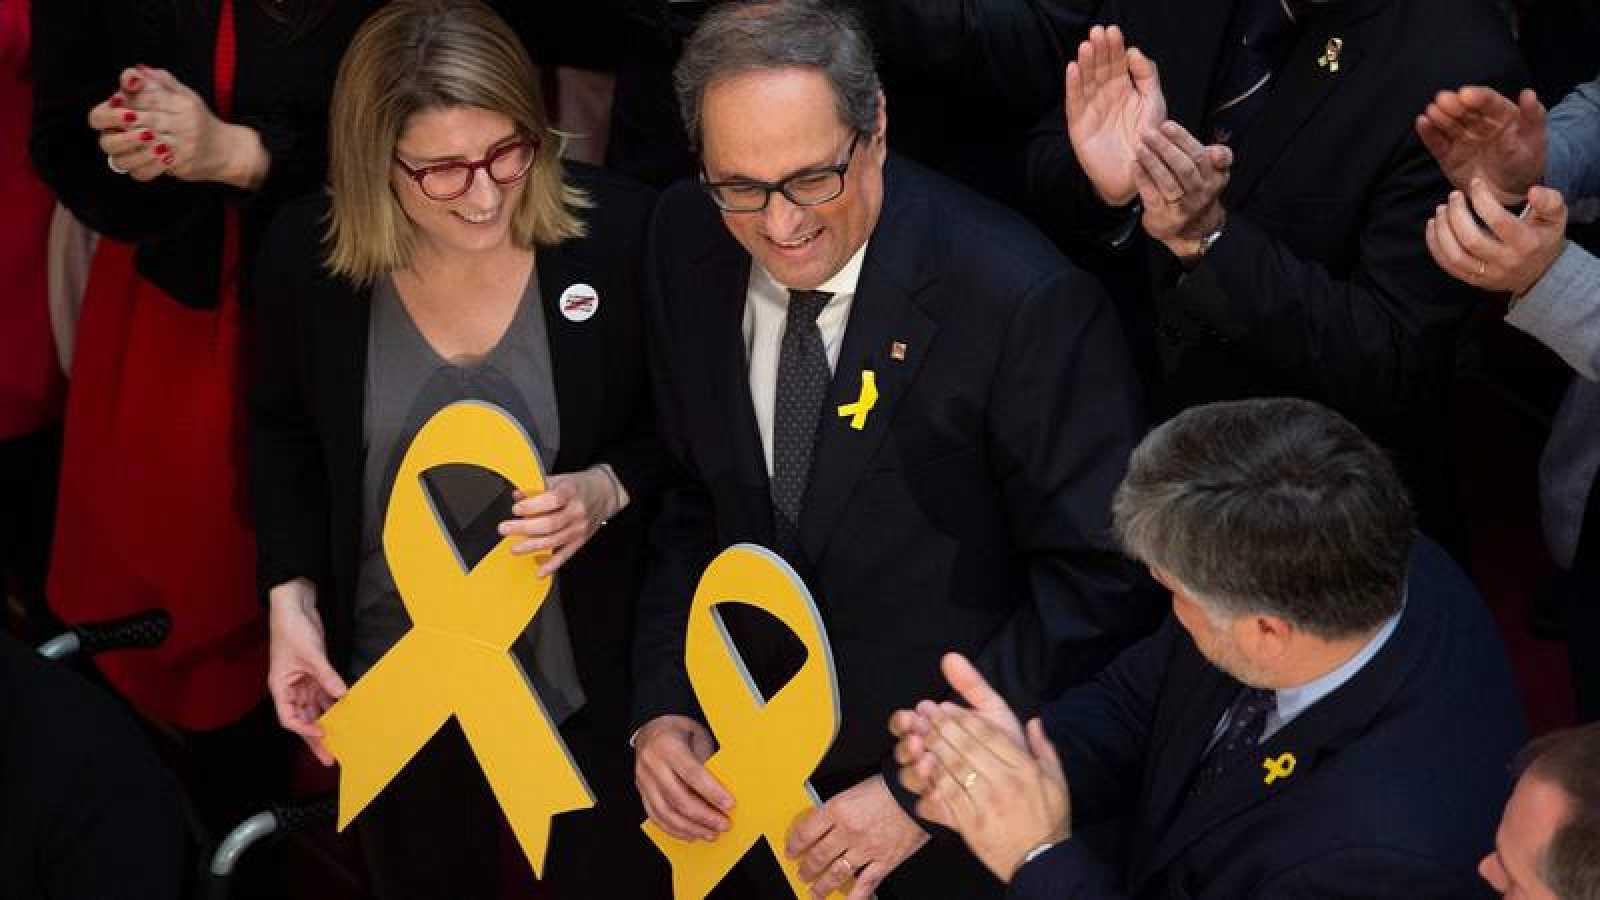 El nuevo president electo de la Generalitat, Quim Torra